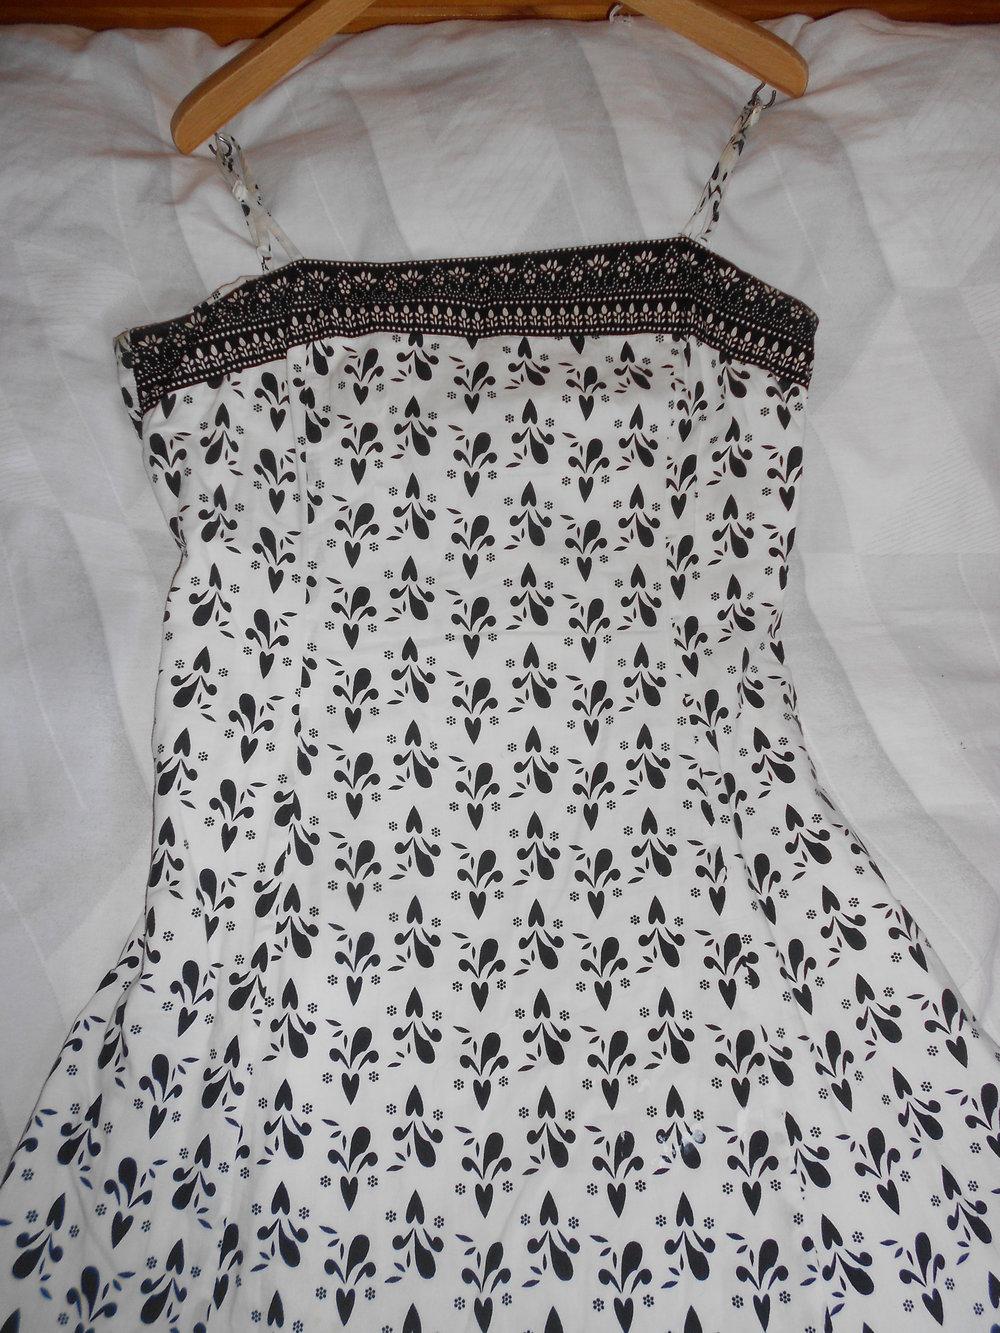 ... Vero Moda 38 Kleid Babydoll Trägerkleid A-Linie Muster Jugendstil Tüll  Glitzer Paisley Jugendstil schwarz . 7941533def